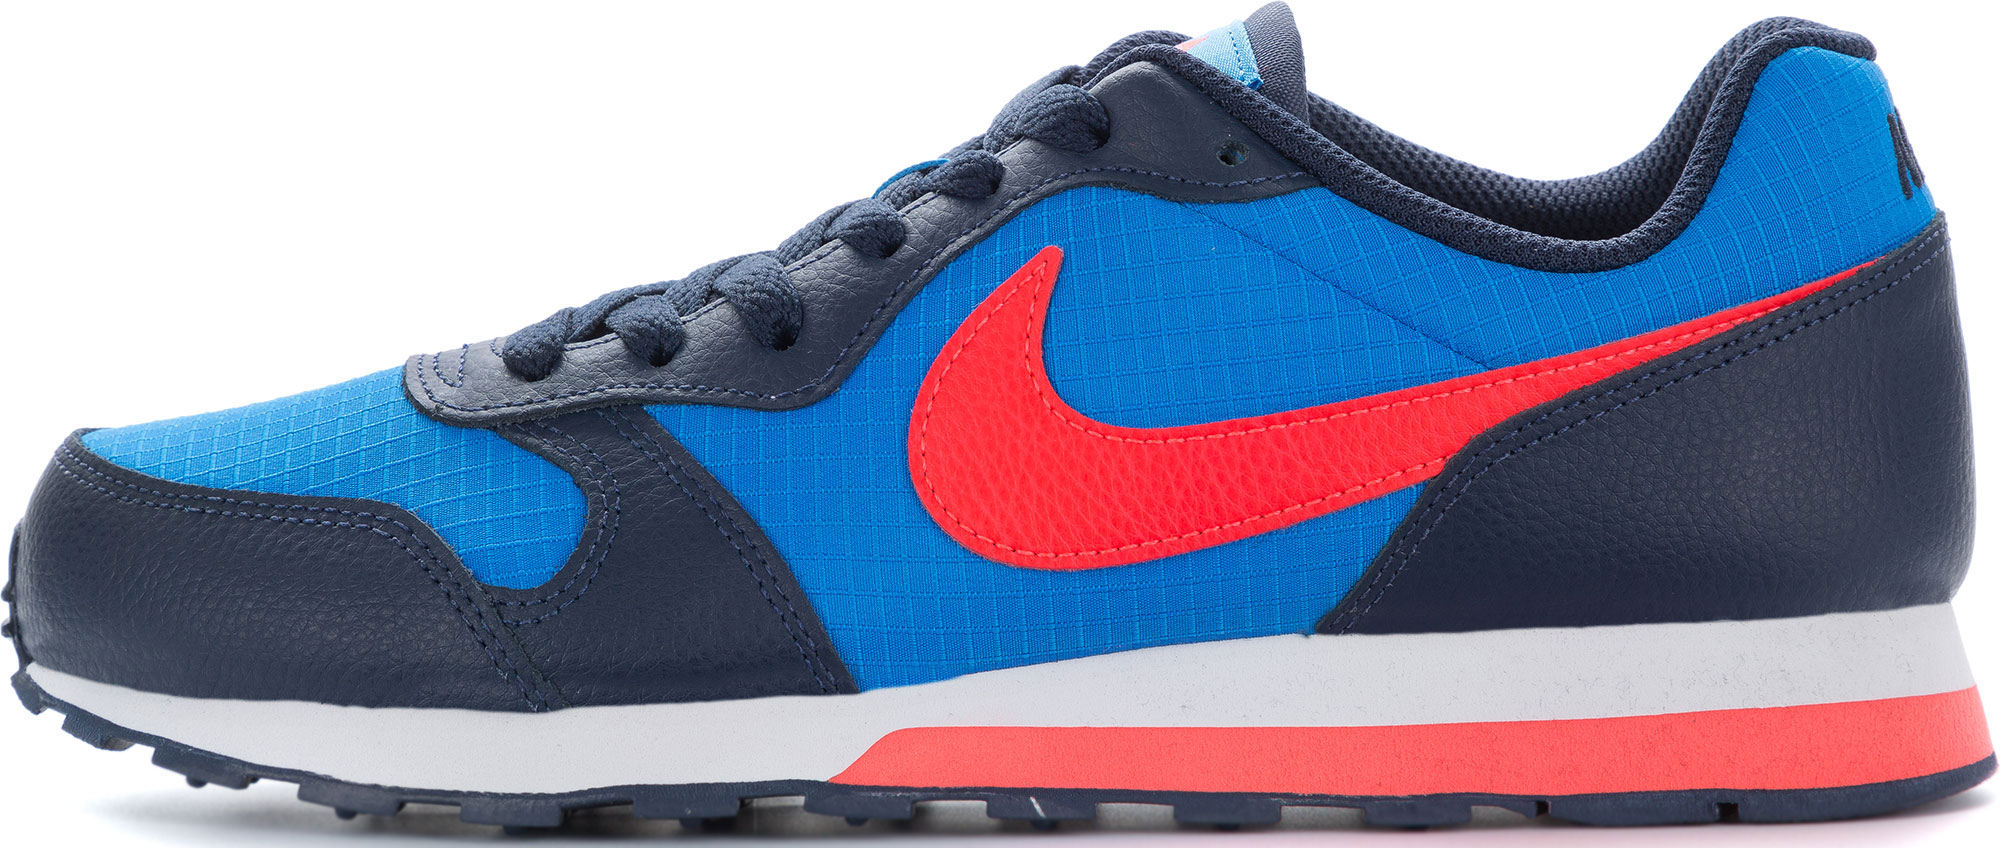 Nike Кроссовки для мальчиков Nike MD Runner 2, размер 39